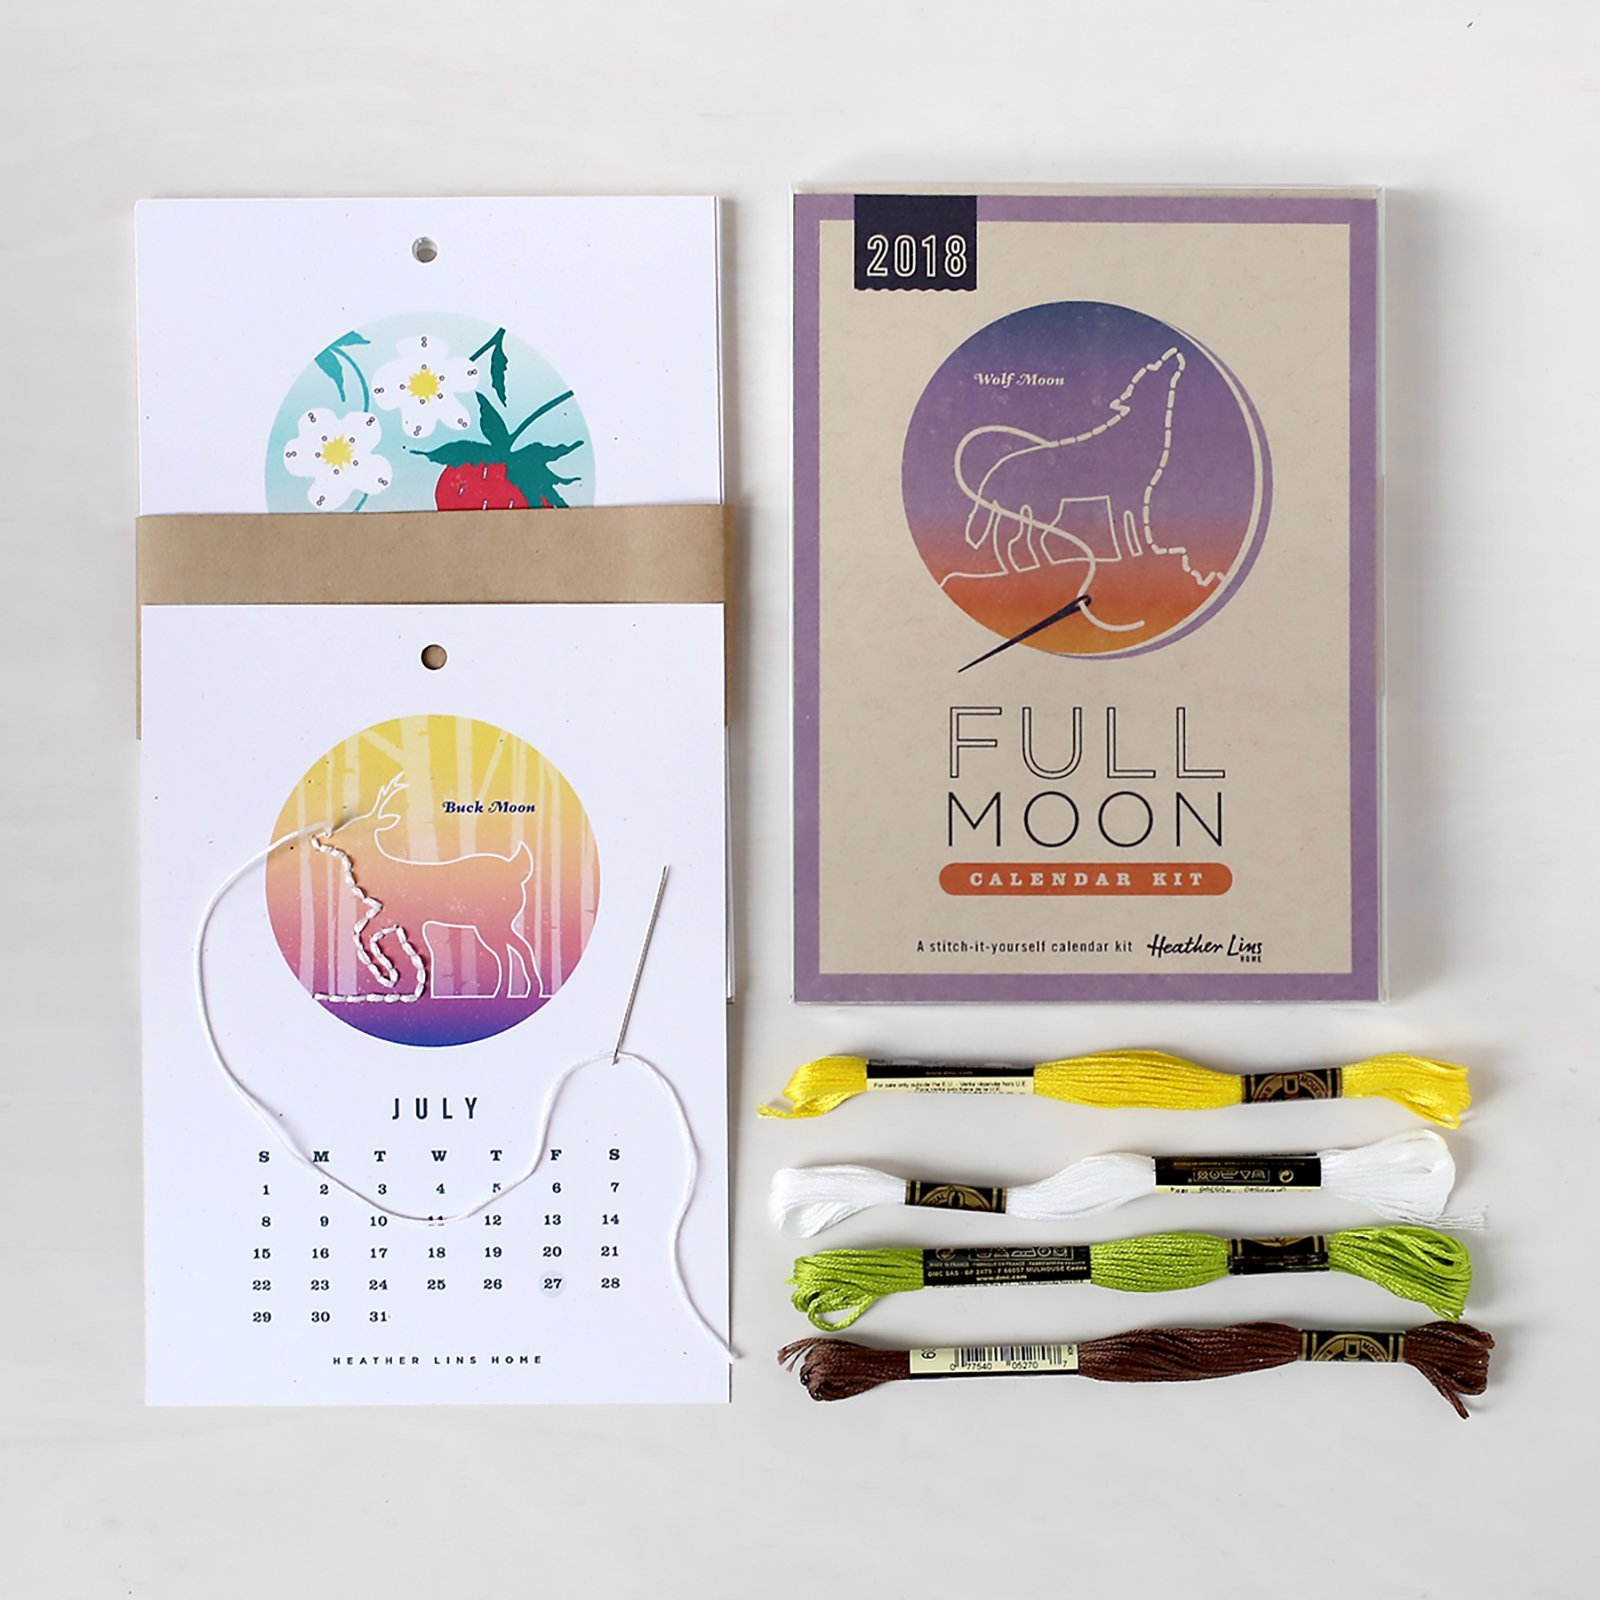 2018 Full Moon Calendar Kit - DIY Kit - Part of Martha Stewart American Made Market